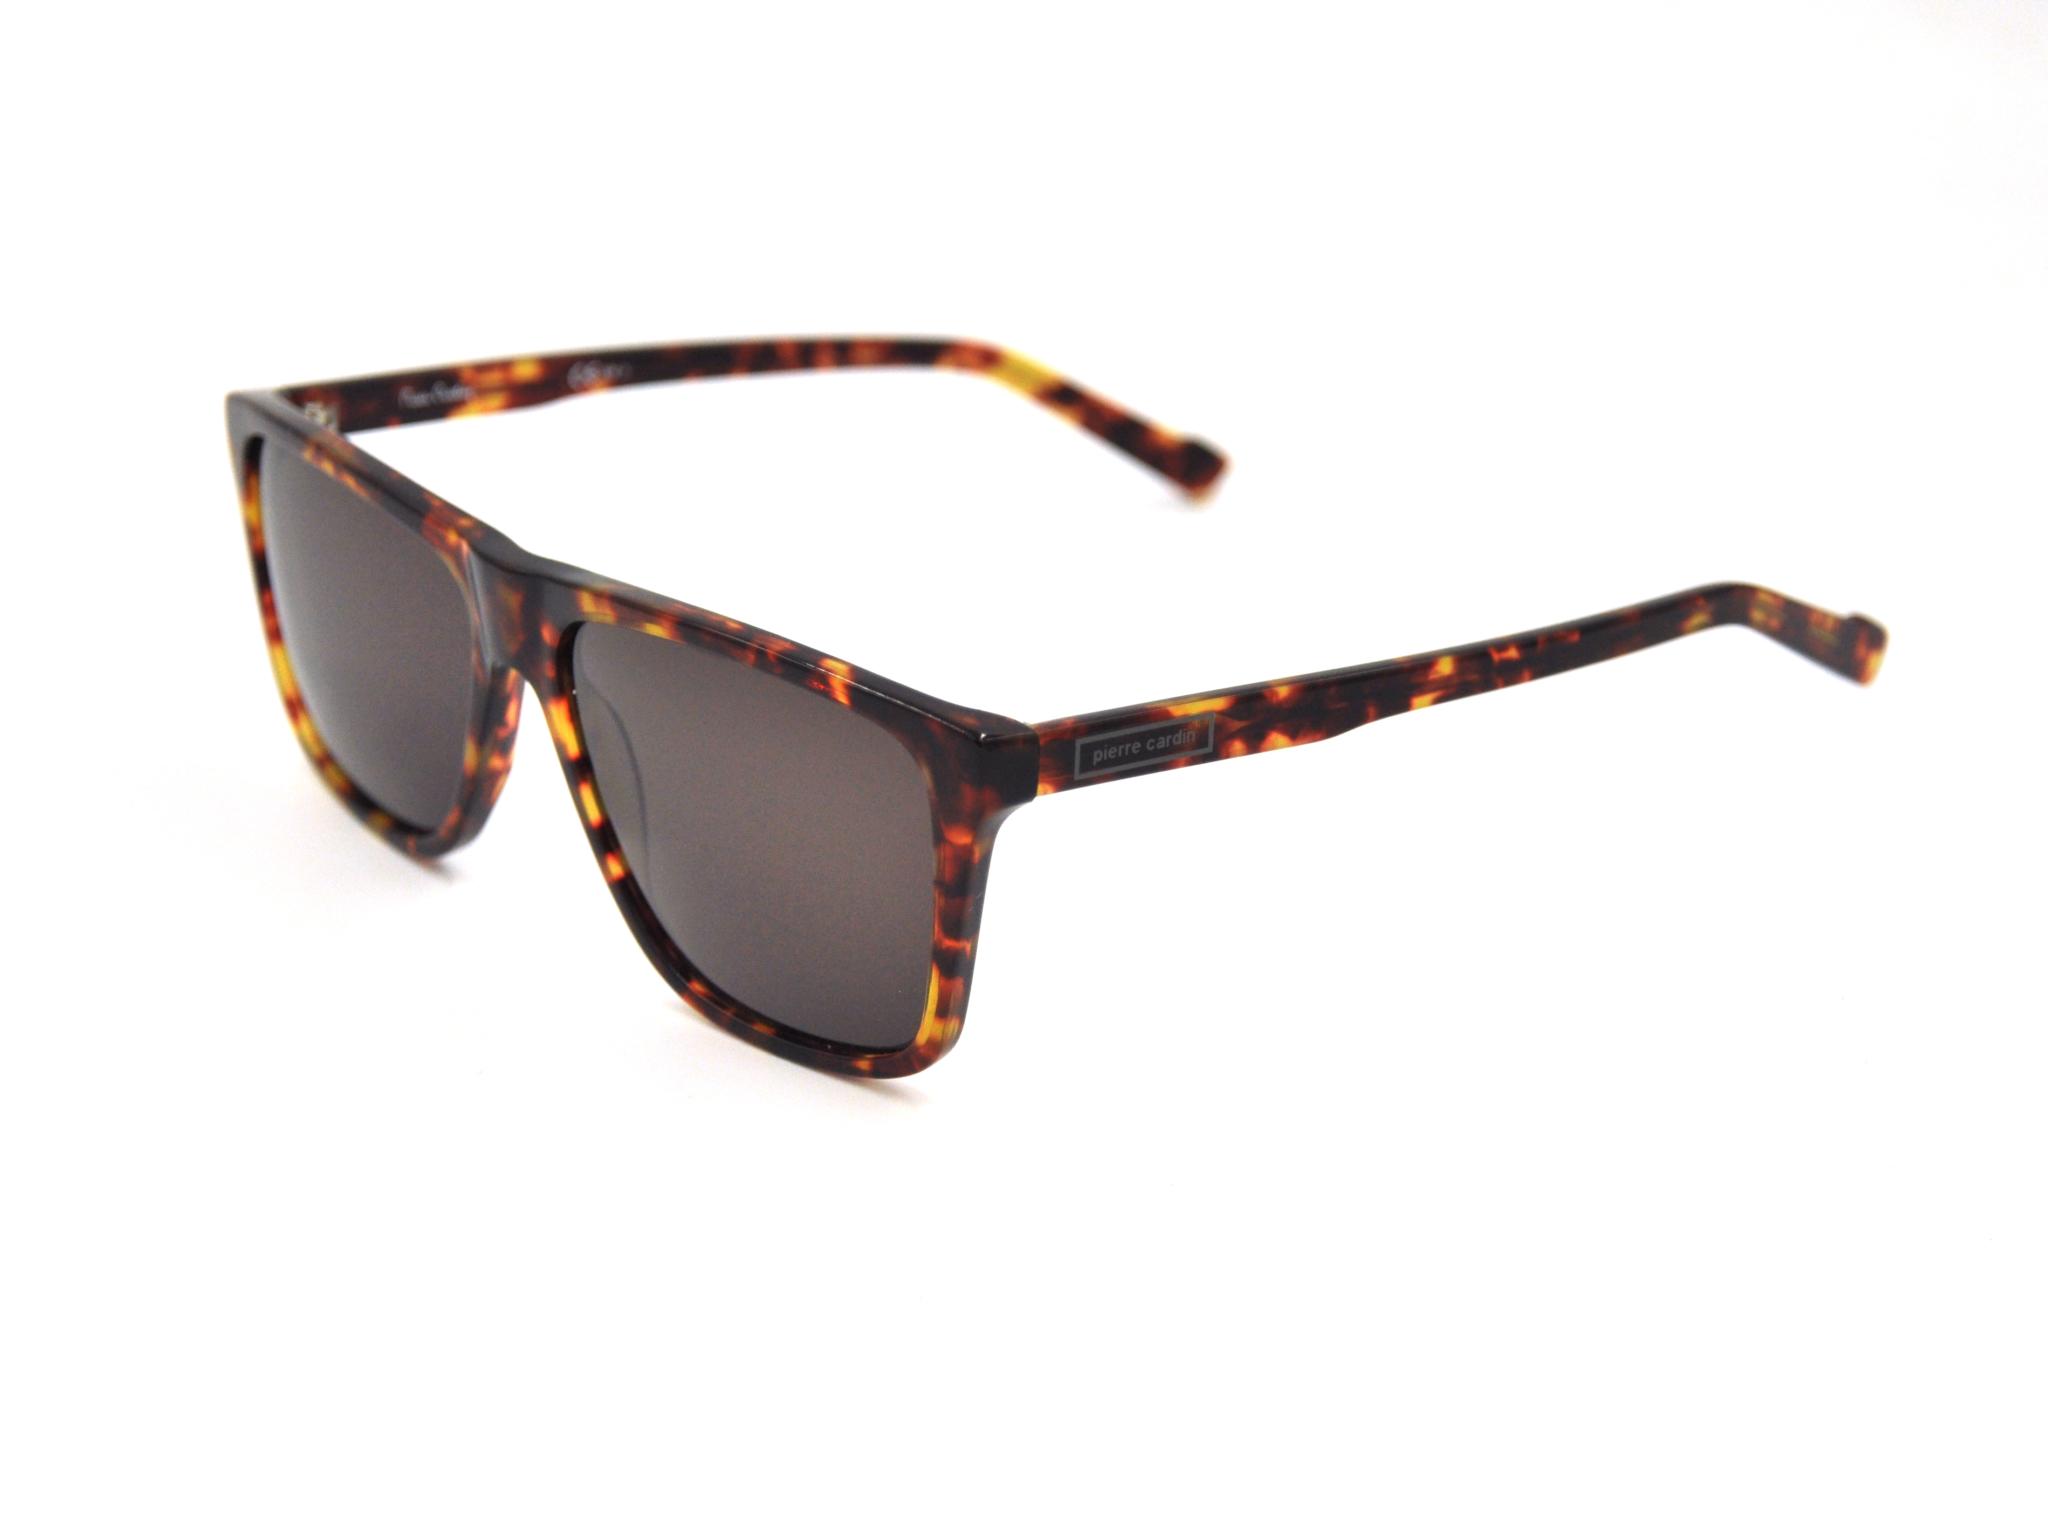 Pierre Cardin P.C 6196/S 086IR UNISEX Sunglasses 2020